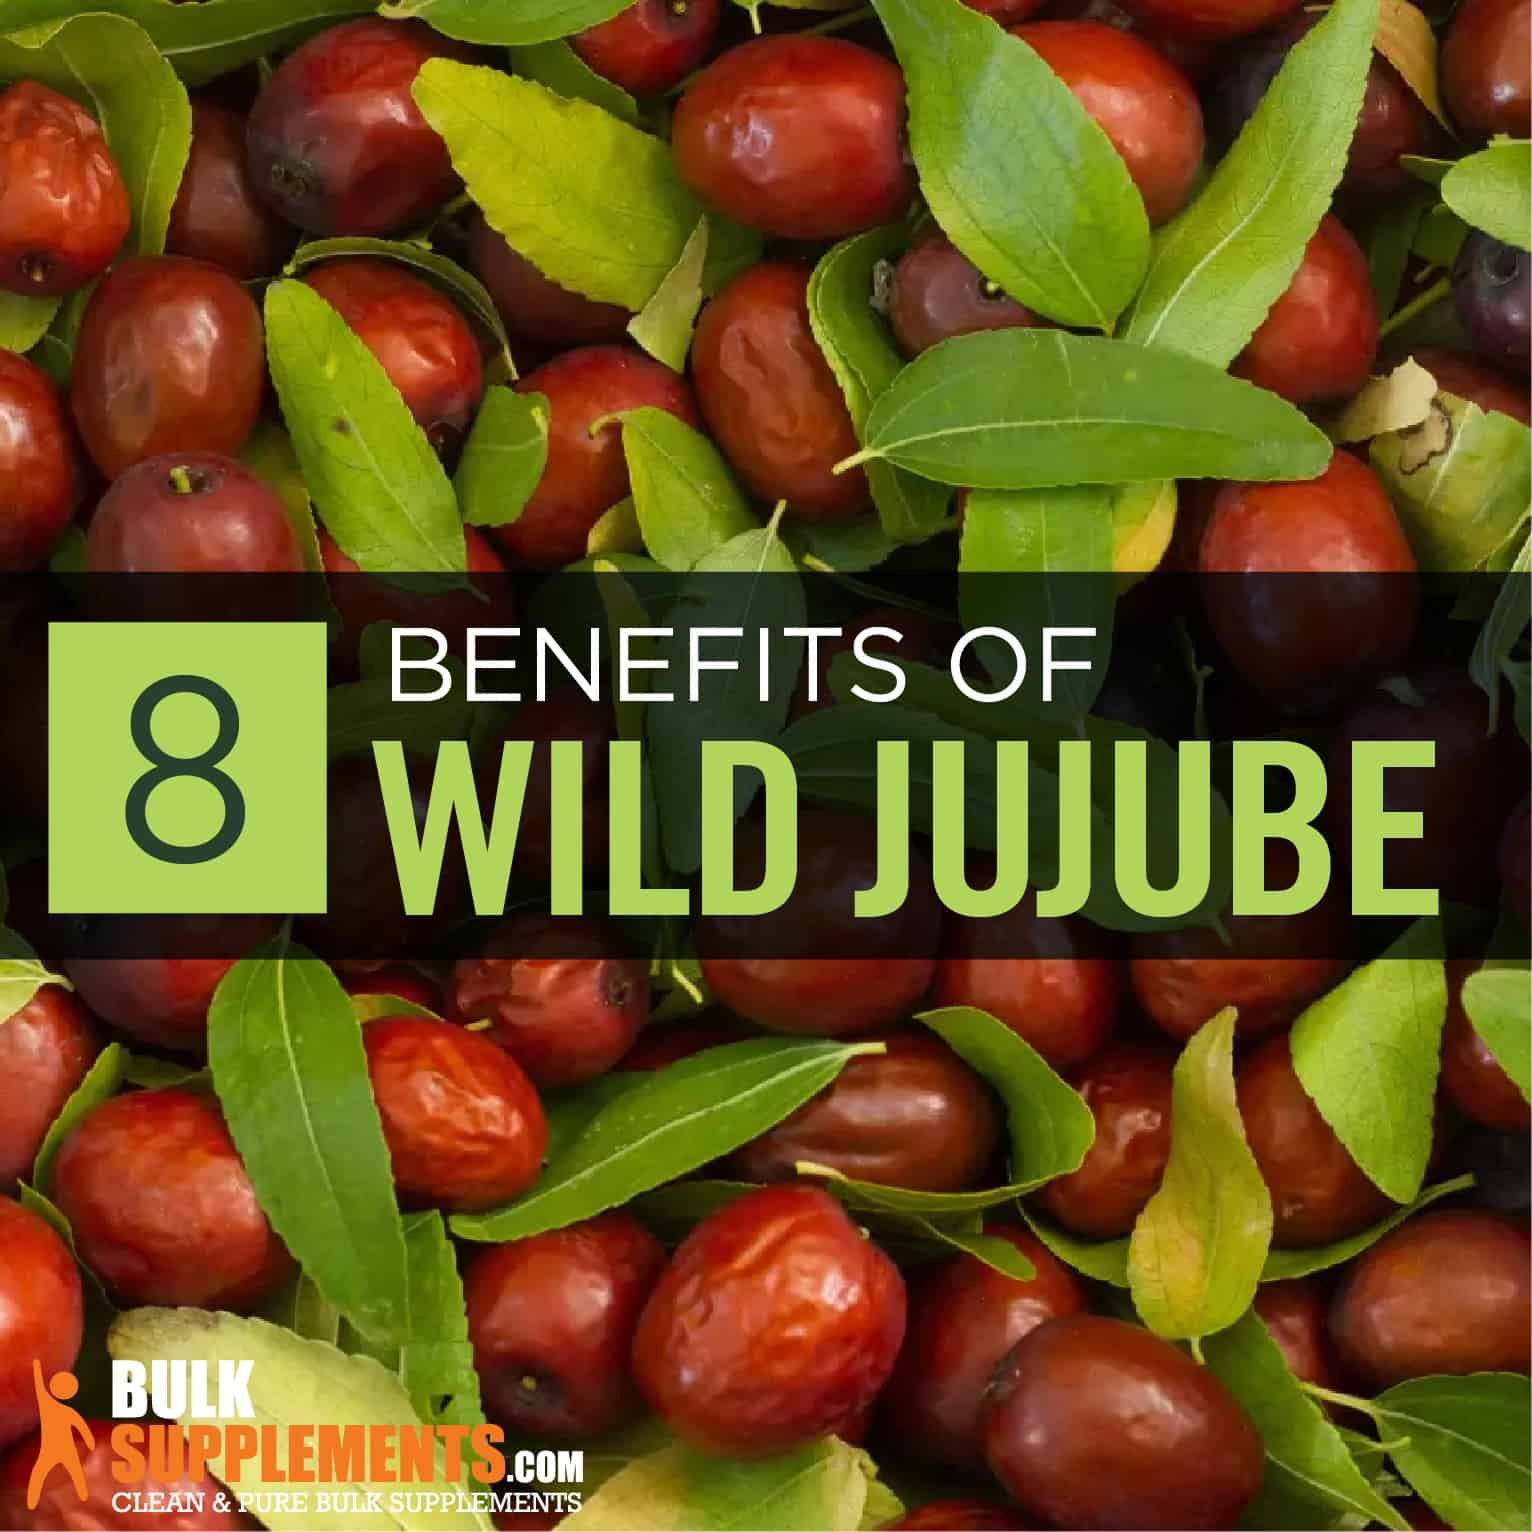 Wild Jujube